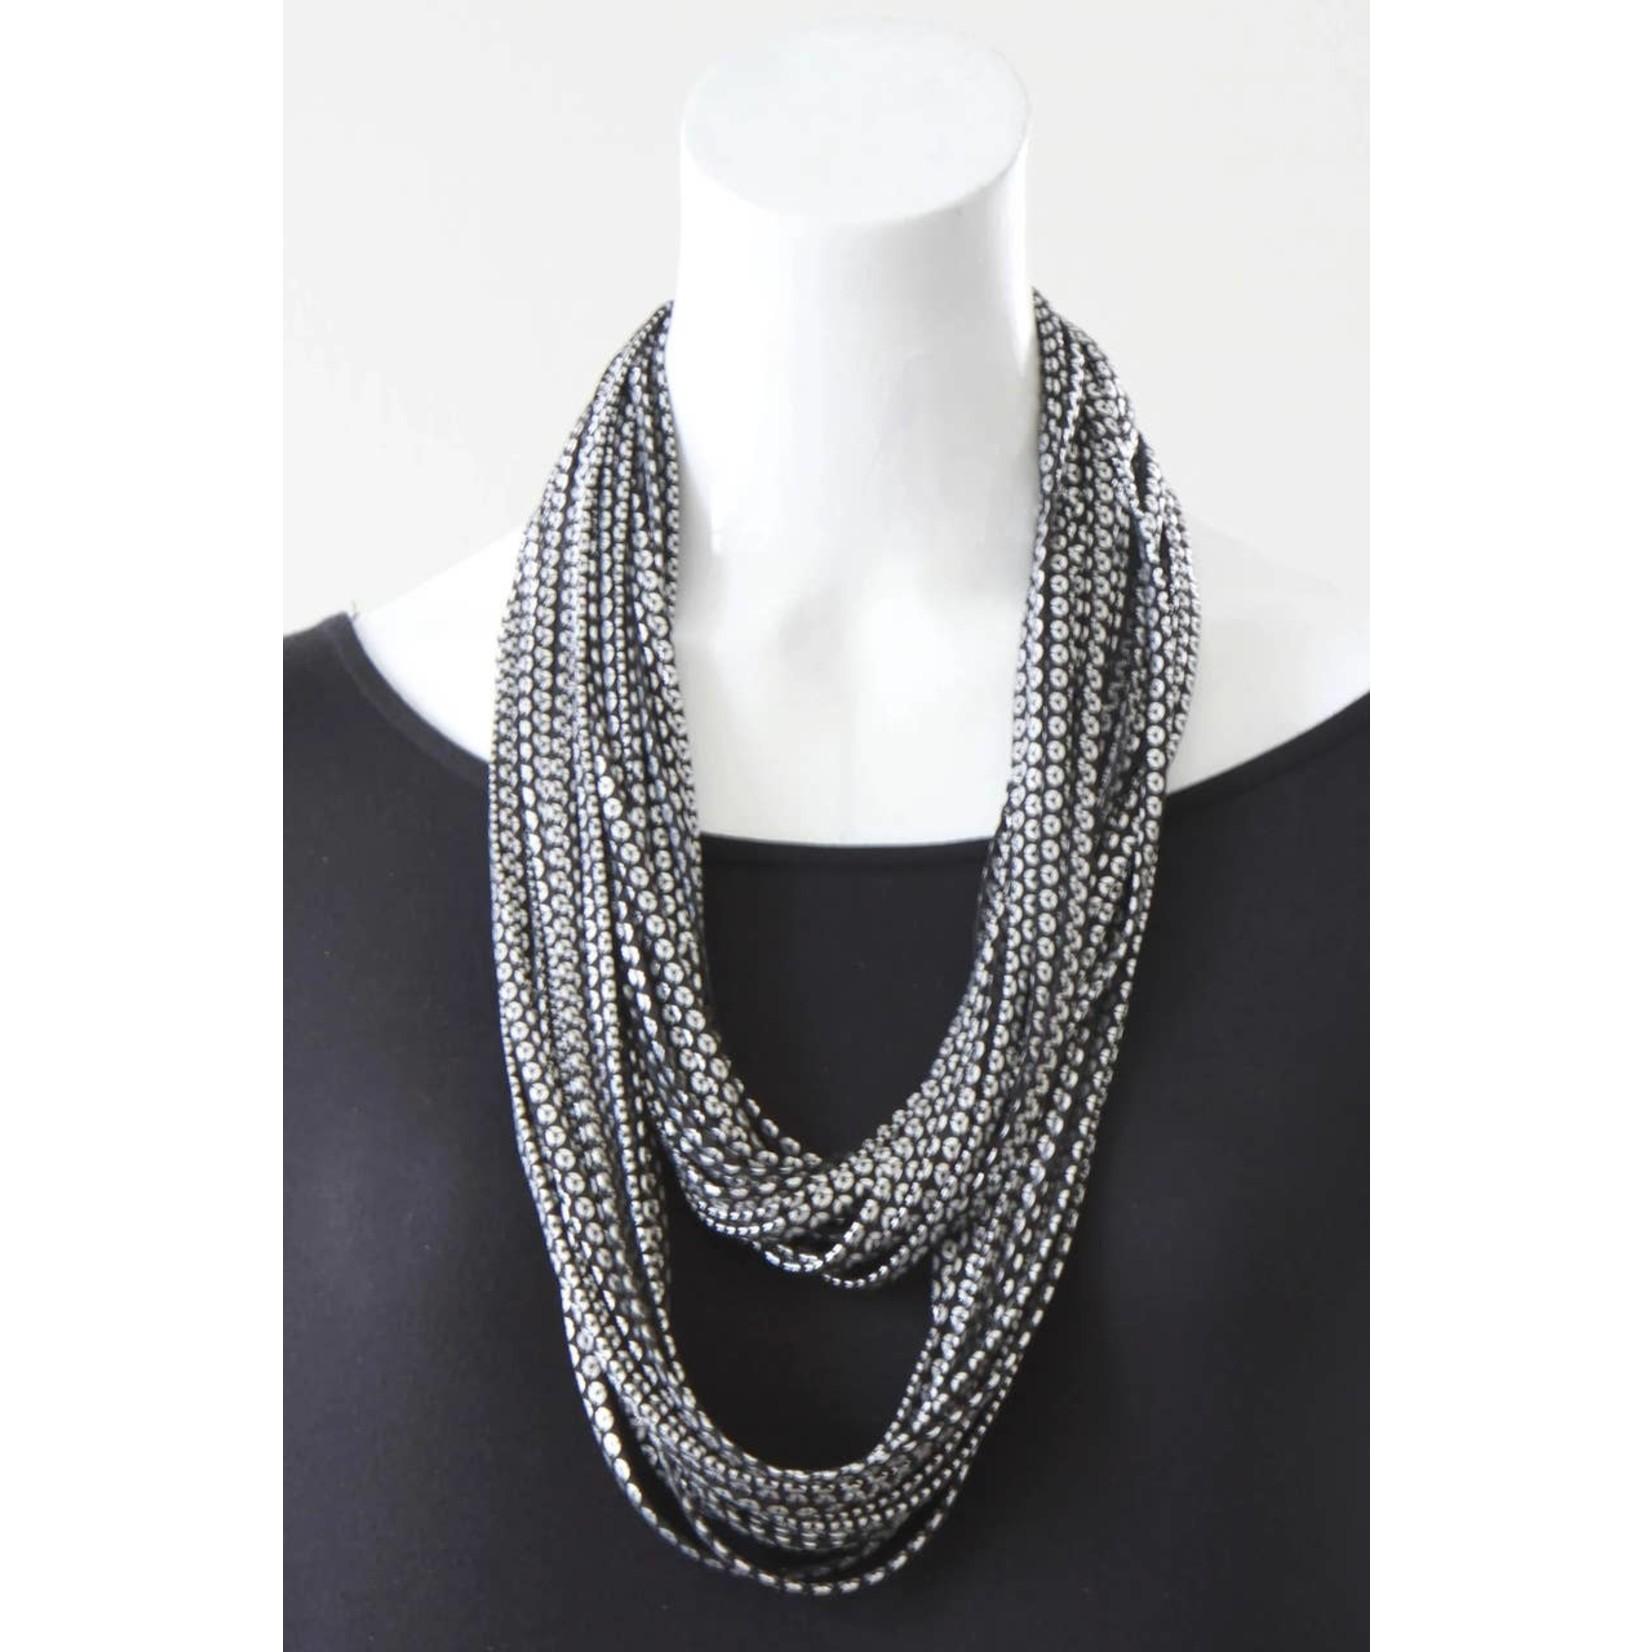 Necknots Medallion Metallic Black and Silver Scarf Necklace